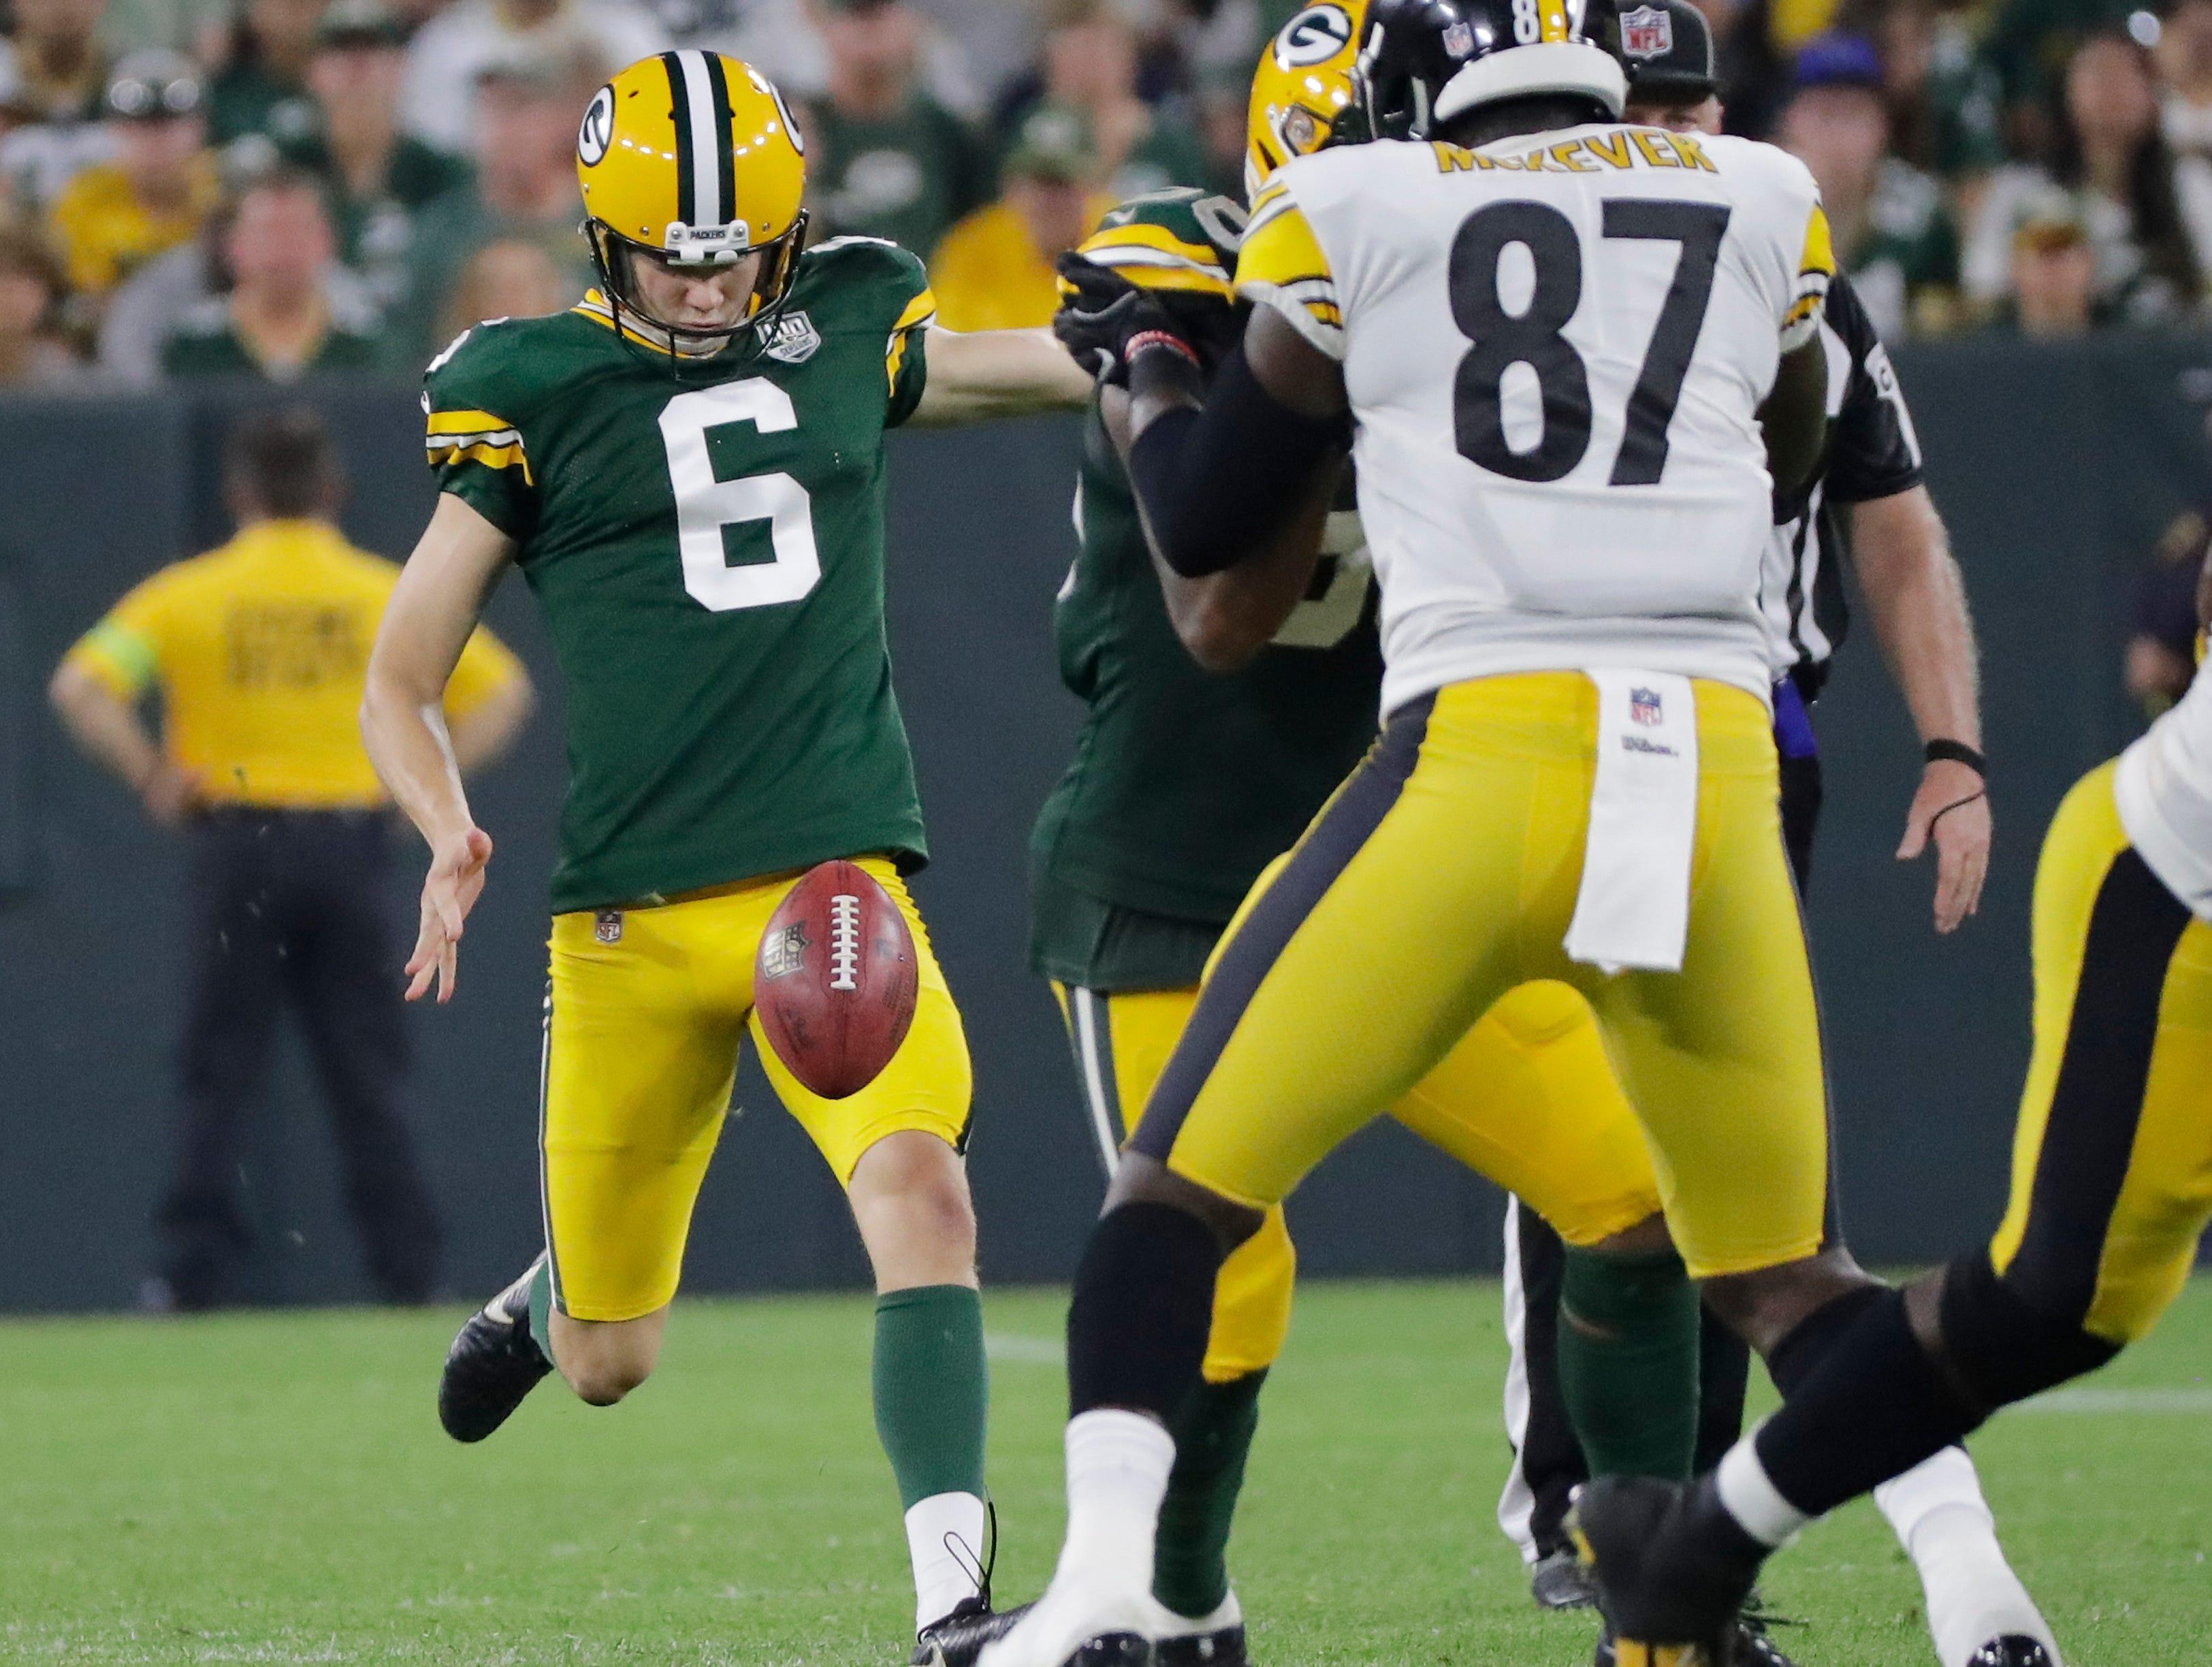 Green Bay Packers punter JK Scott (6) punts in an NFL preseason game at Lambeau Field on Thursday, August 16, 2018 in Green Bay, Wis.